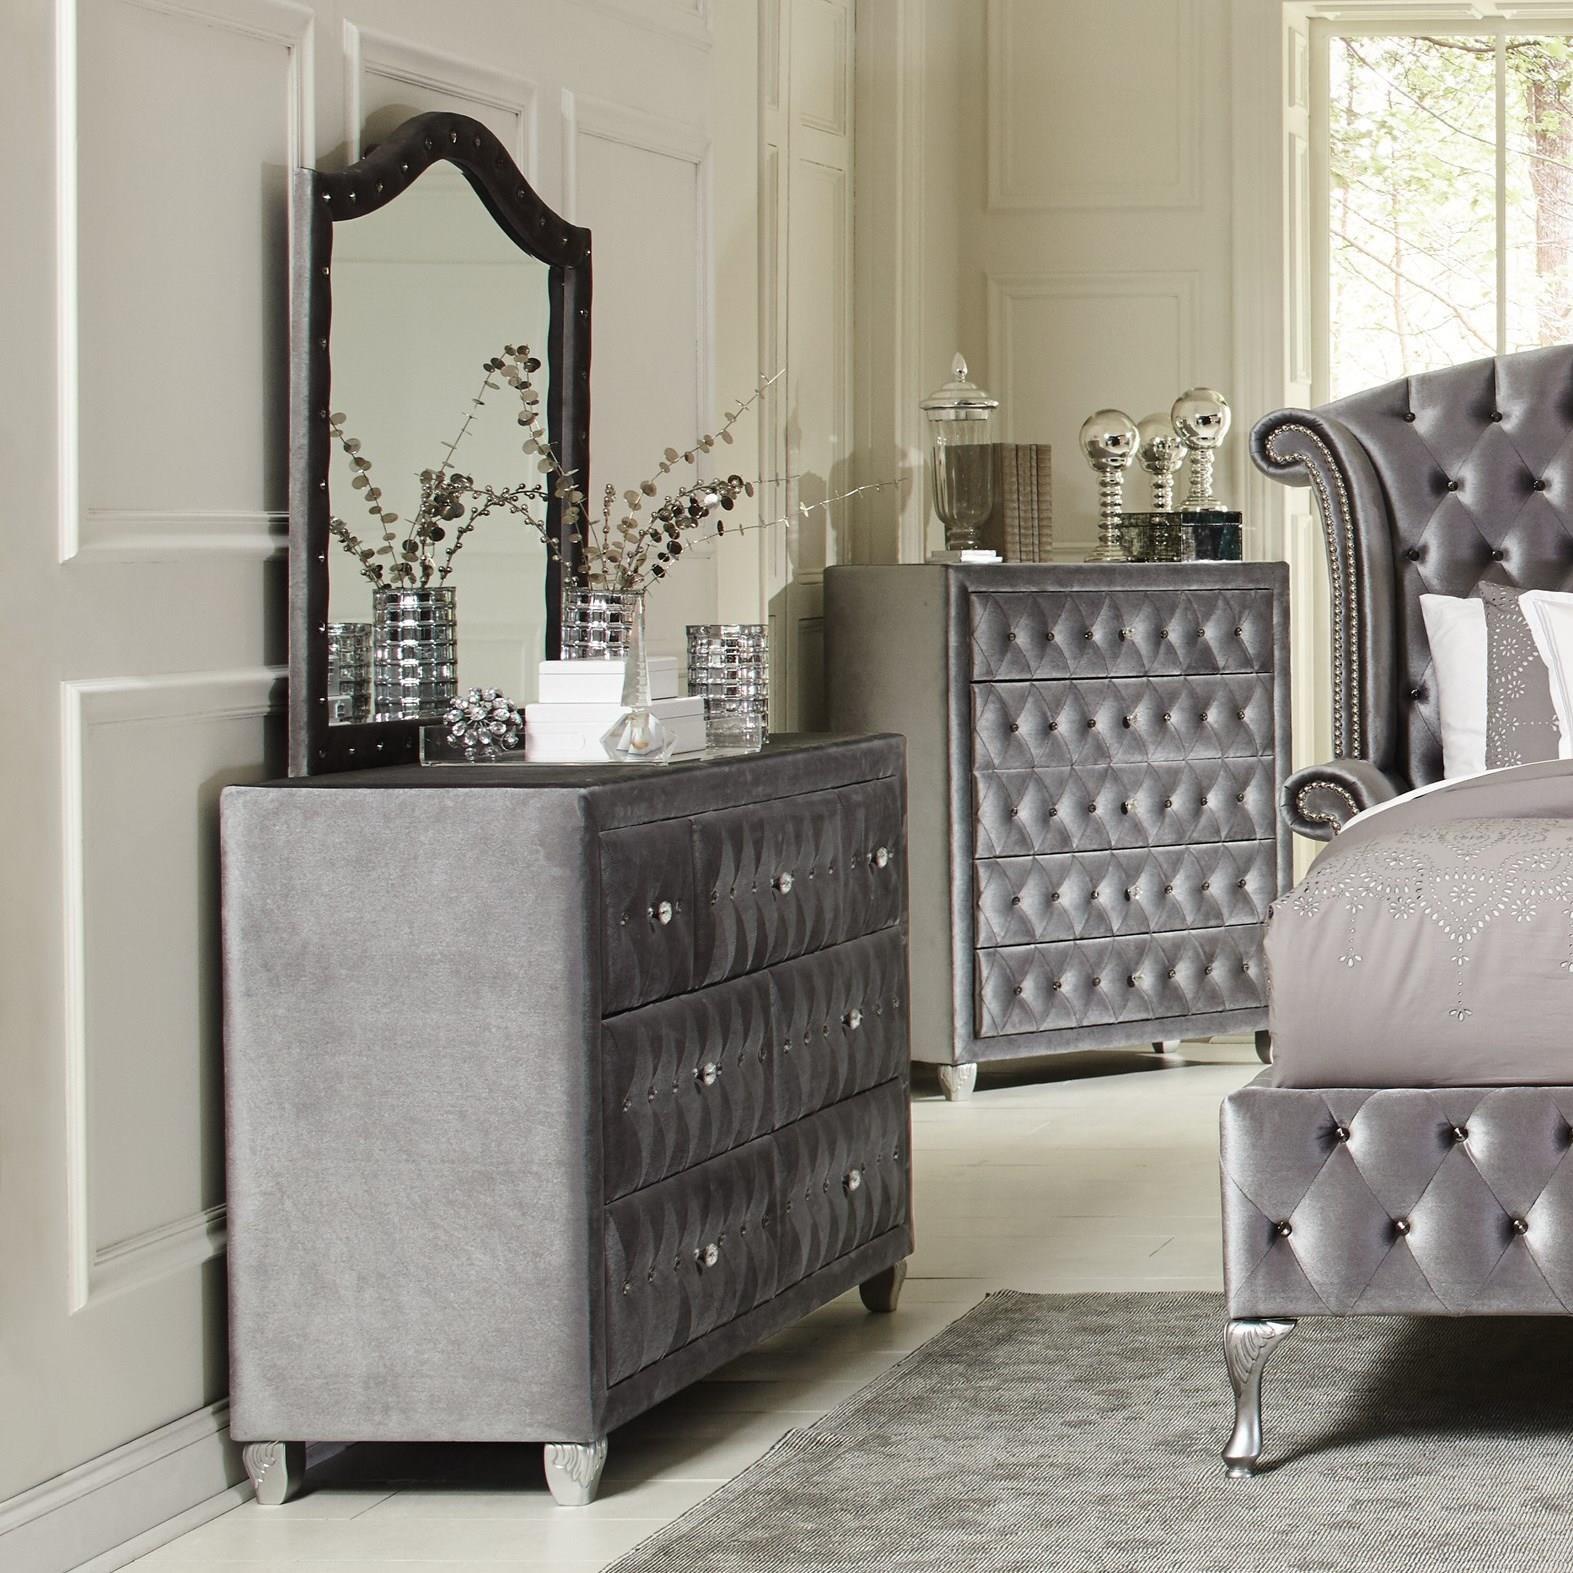 Coaster Deanna Upholstered Dresser And Mirror Set With Faceted Buttons A1 Furniture Mattress Dresser Mirror Sets